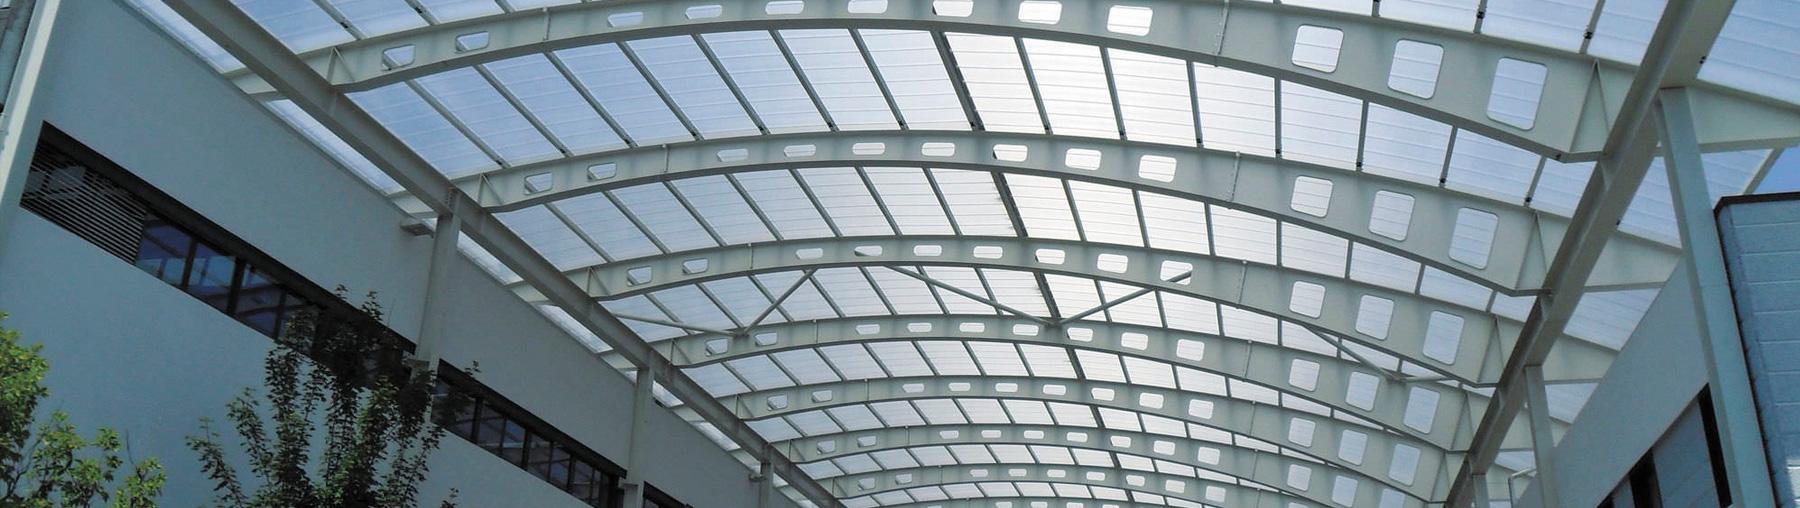 Fibreglass Roof Sheeting   Sheeting Direct